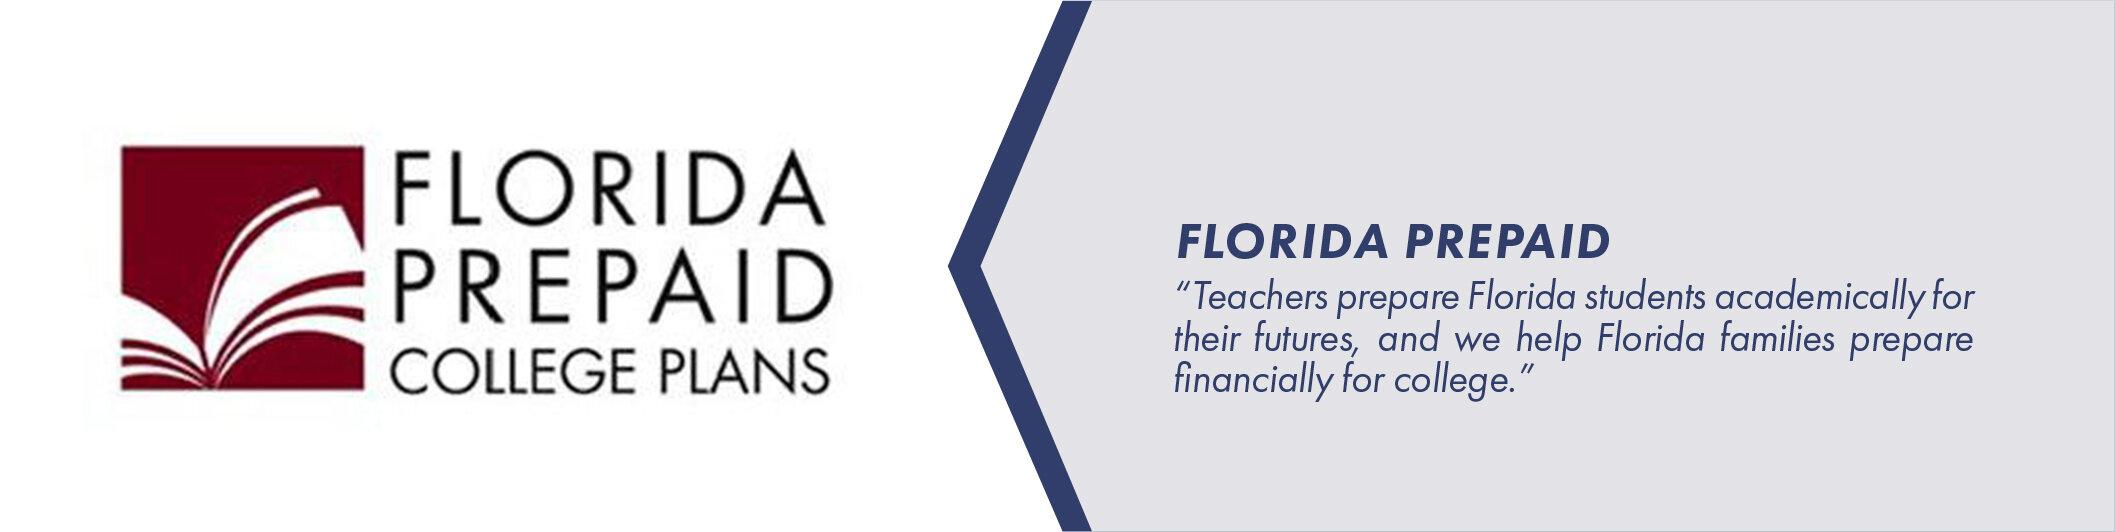 Florida+Prepaid+Homepage.jpg